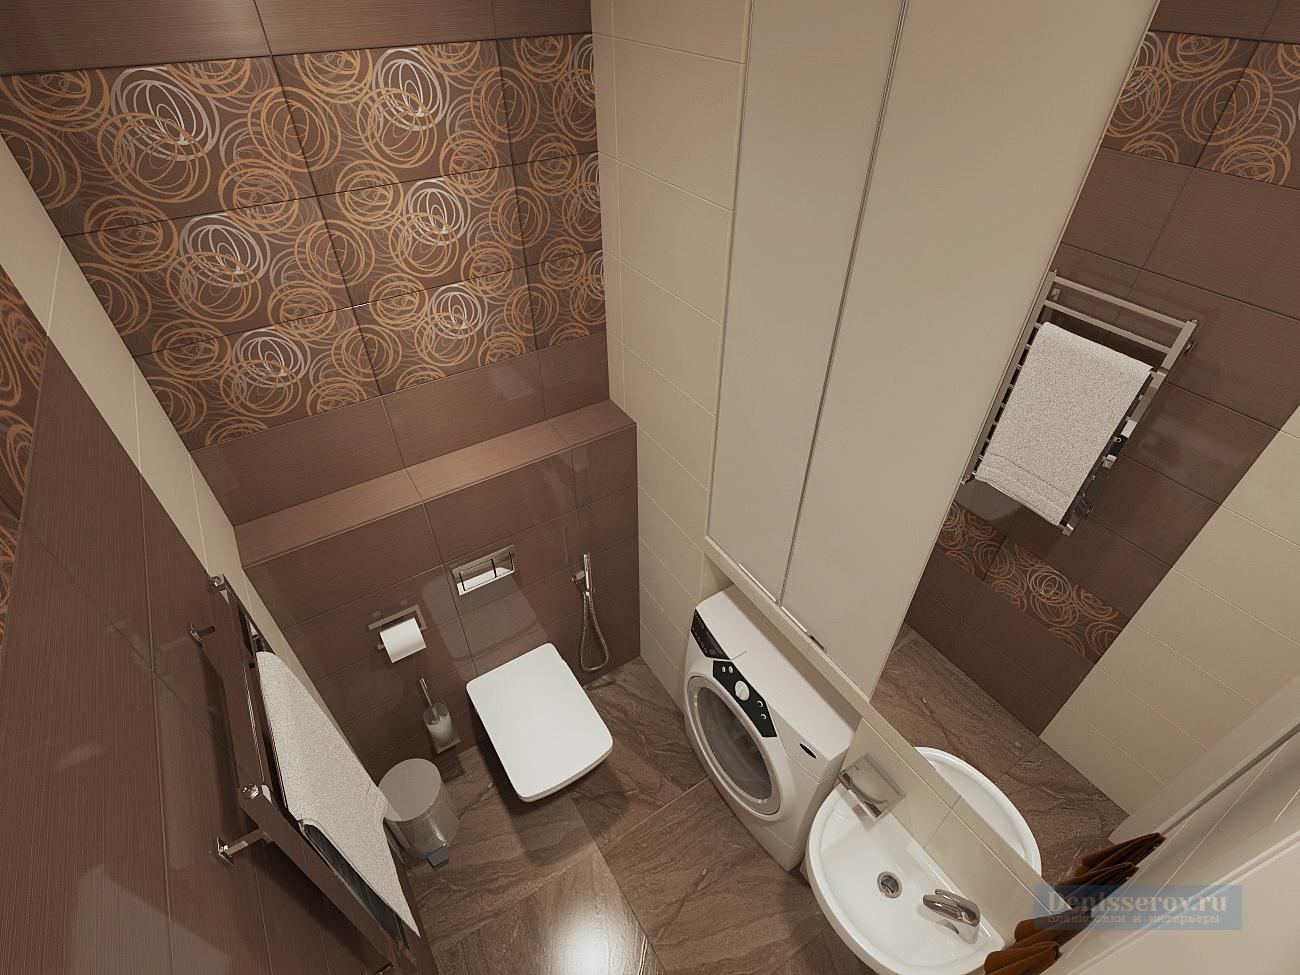 Dizajn-tualet-2-kv-m-v-korichnevom-cvete-4